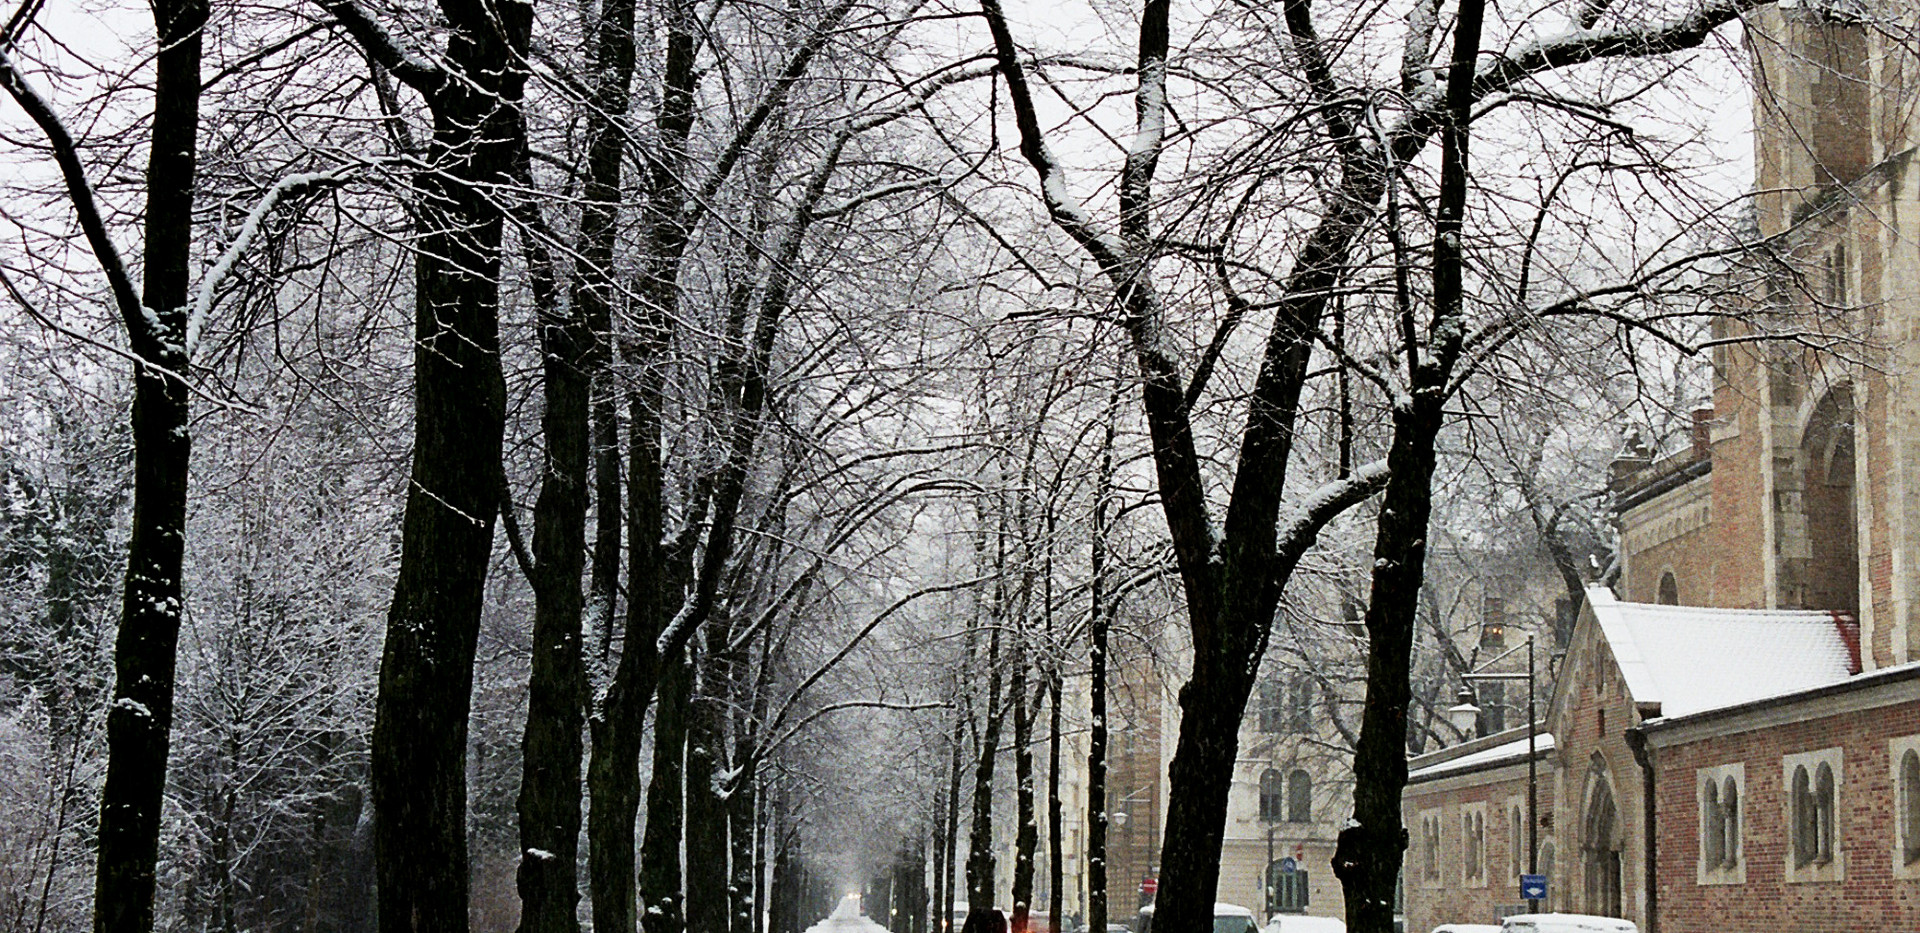 Munich, Germany, February 2018